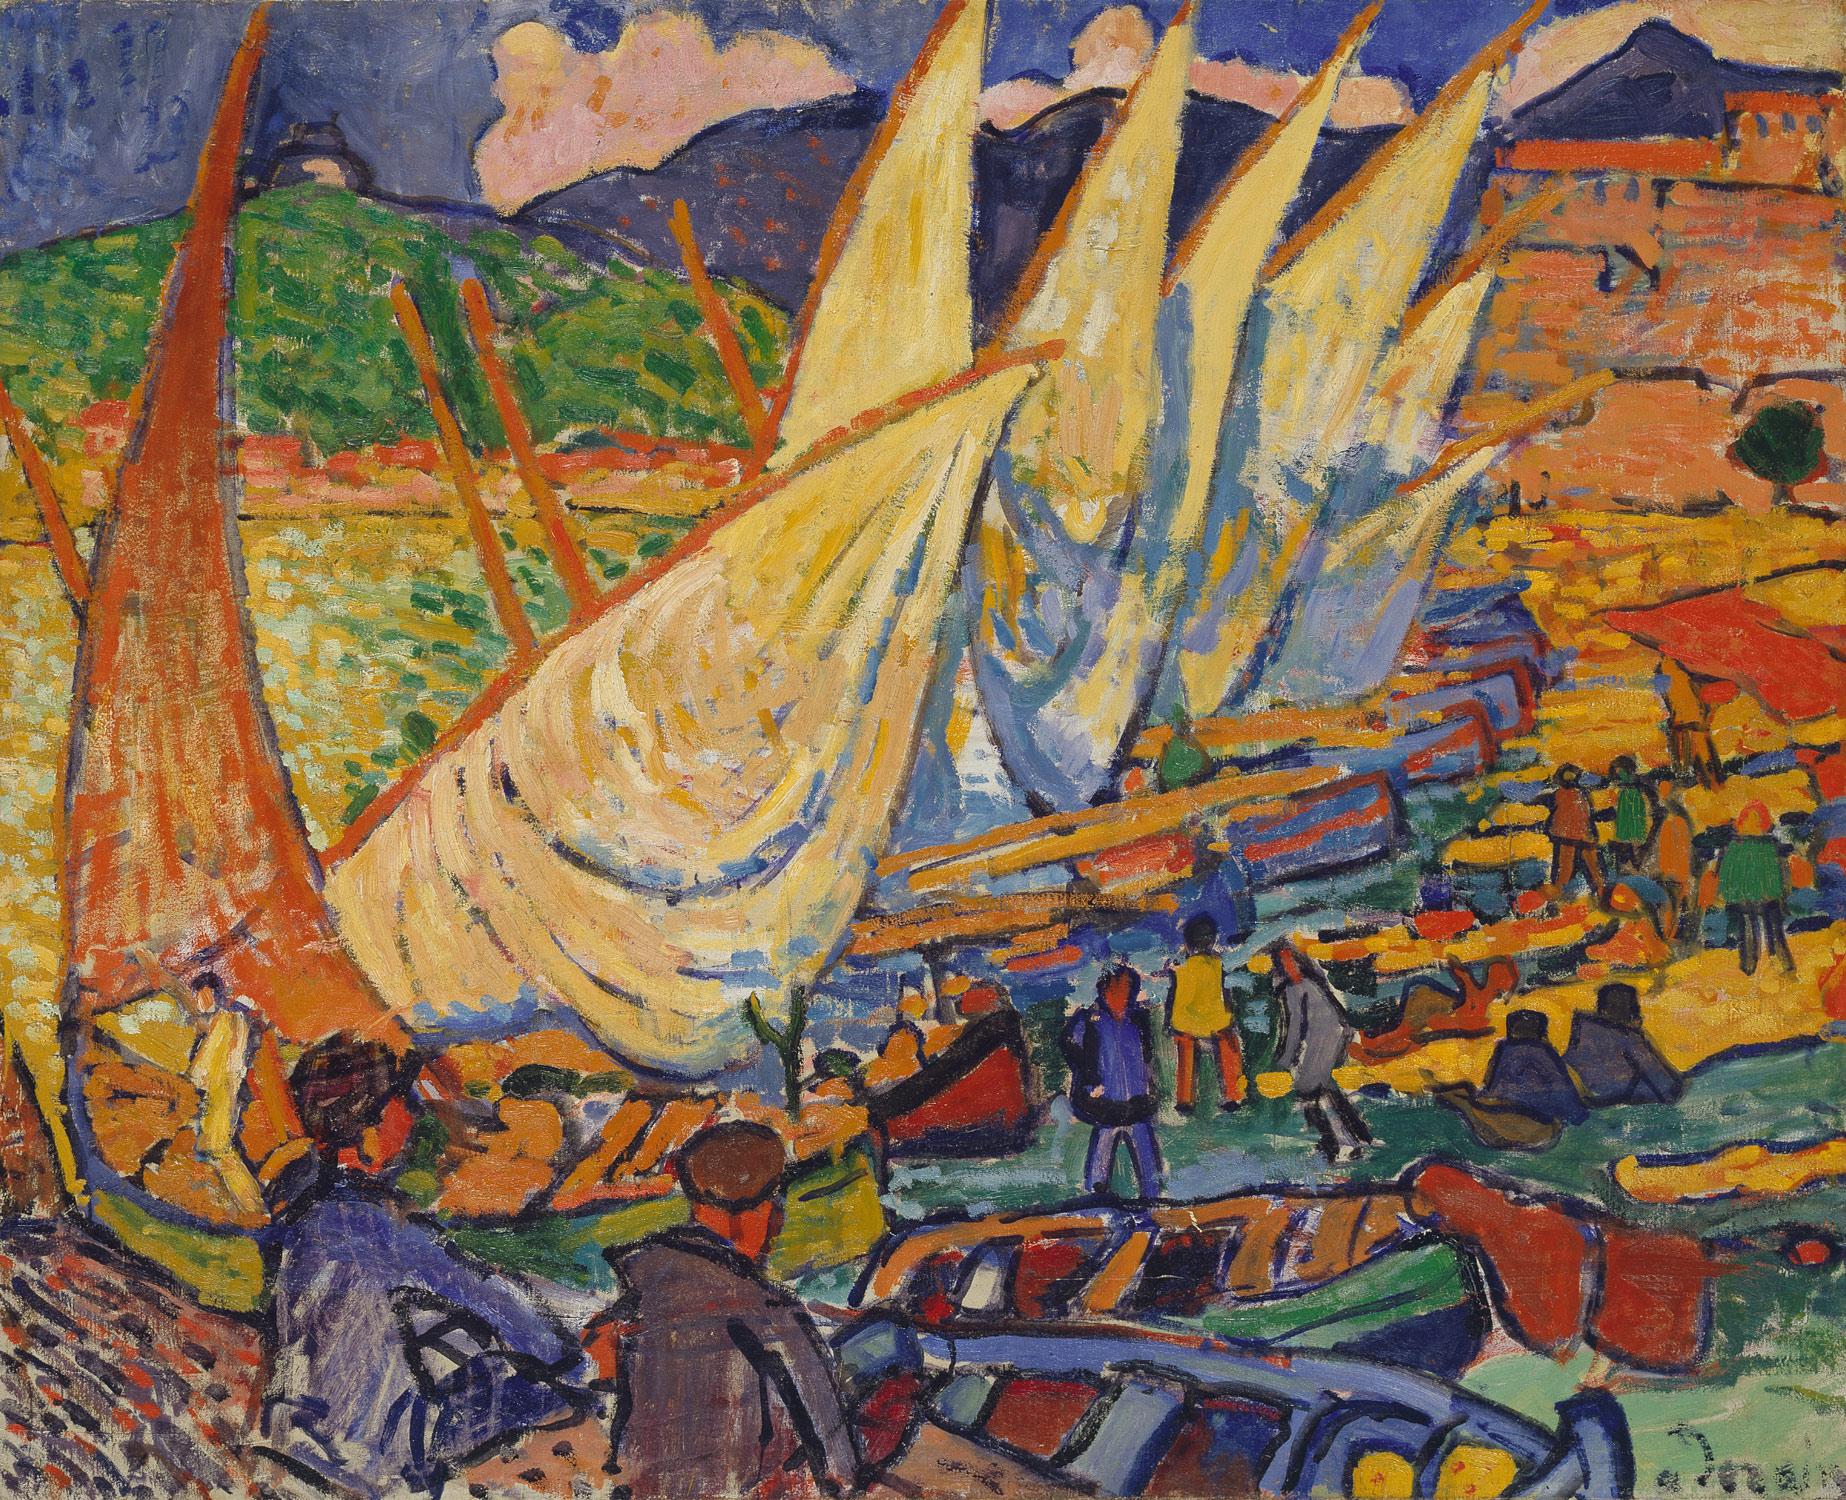 Fishing boats, Collioure, Derain.